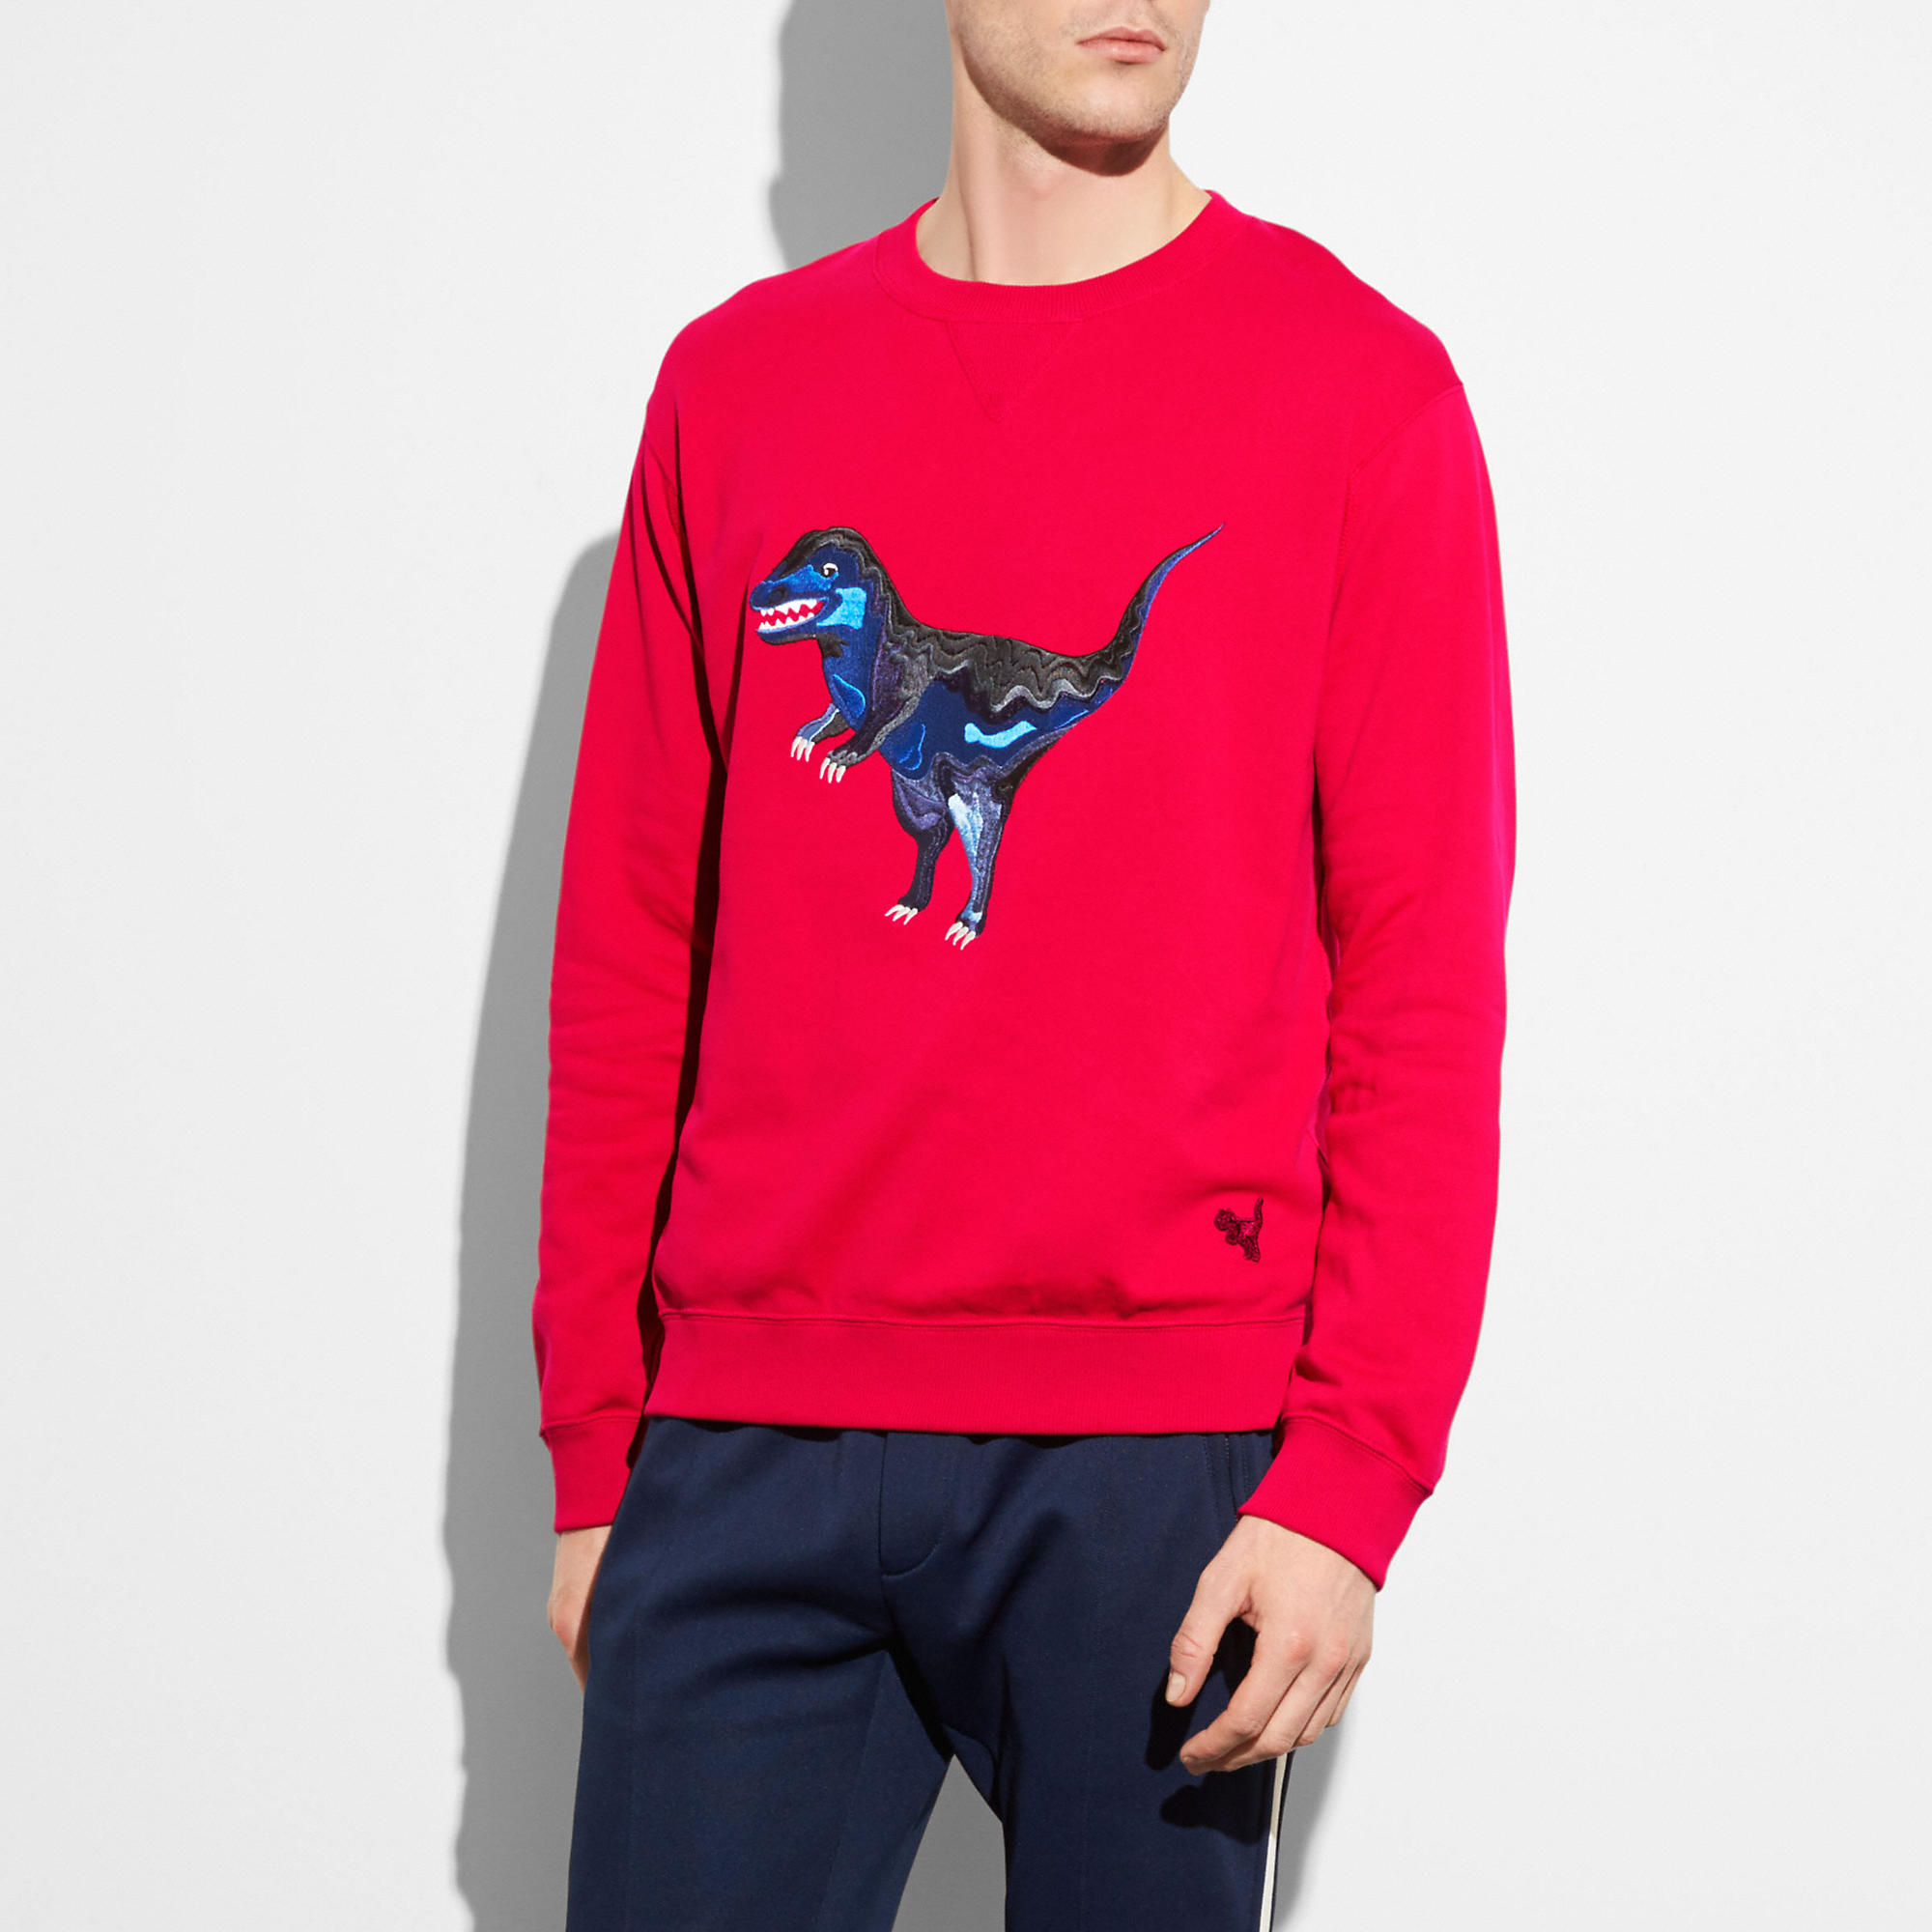 Coach Embroidered Rexy Sweatshirt